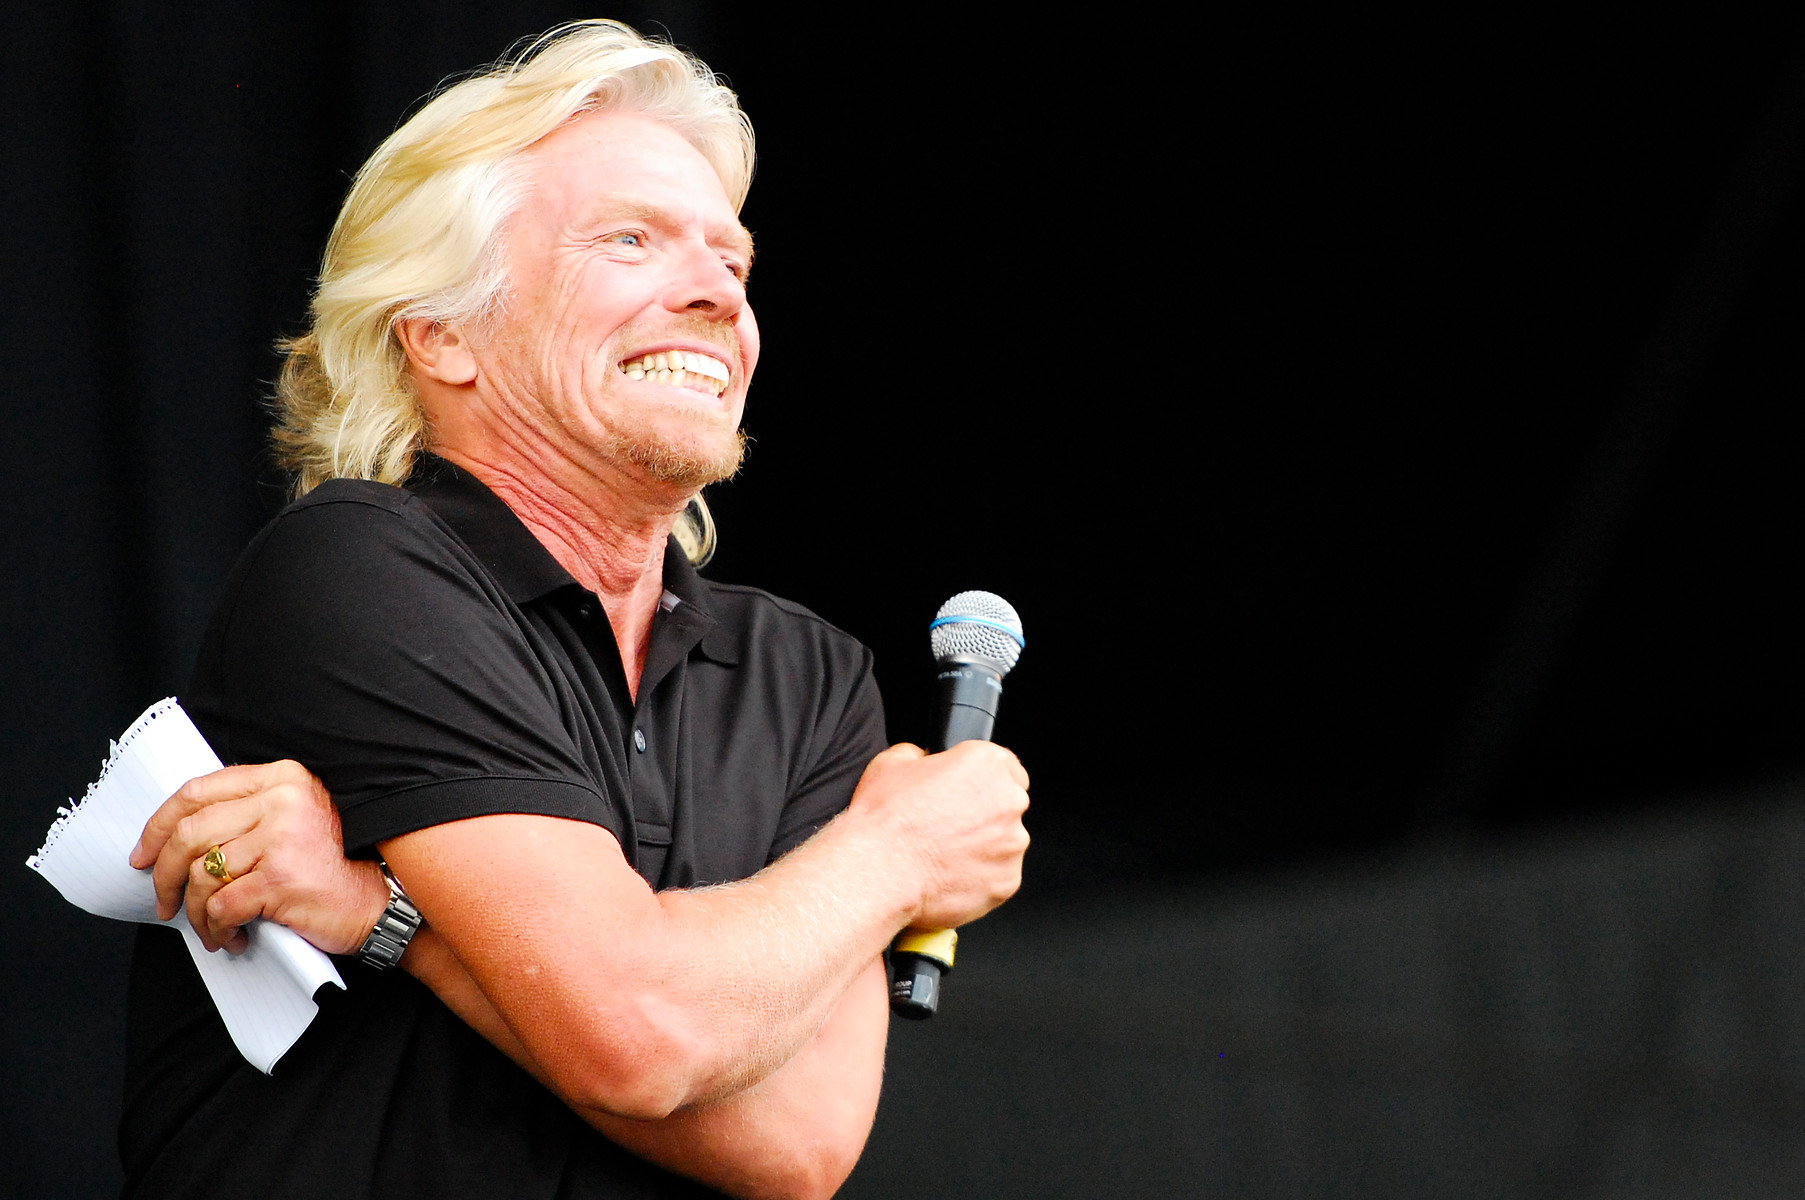 Richard Branson's top three business tips